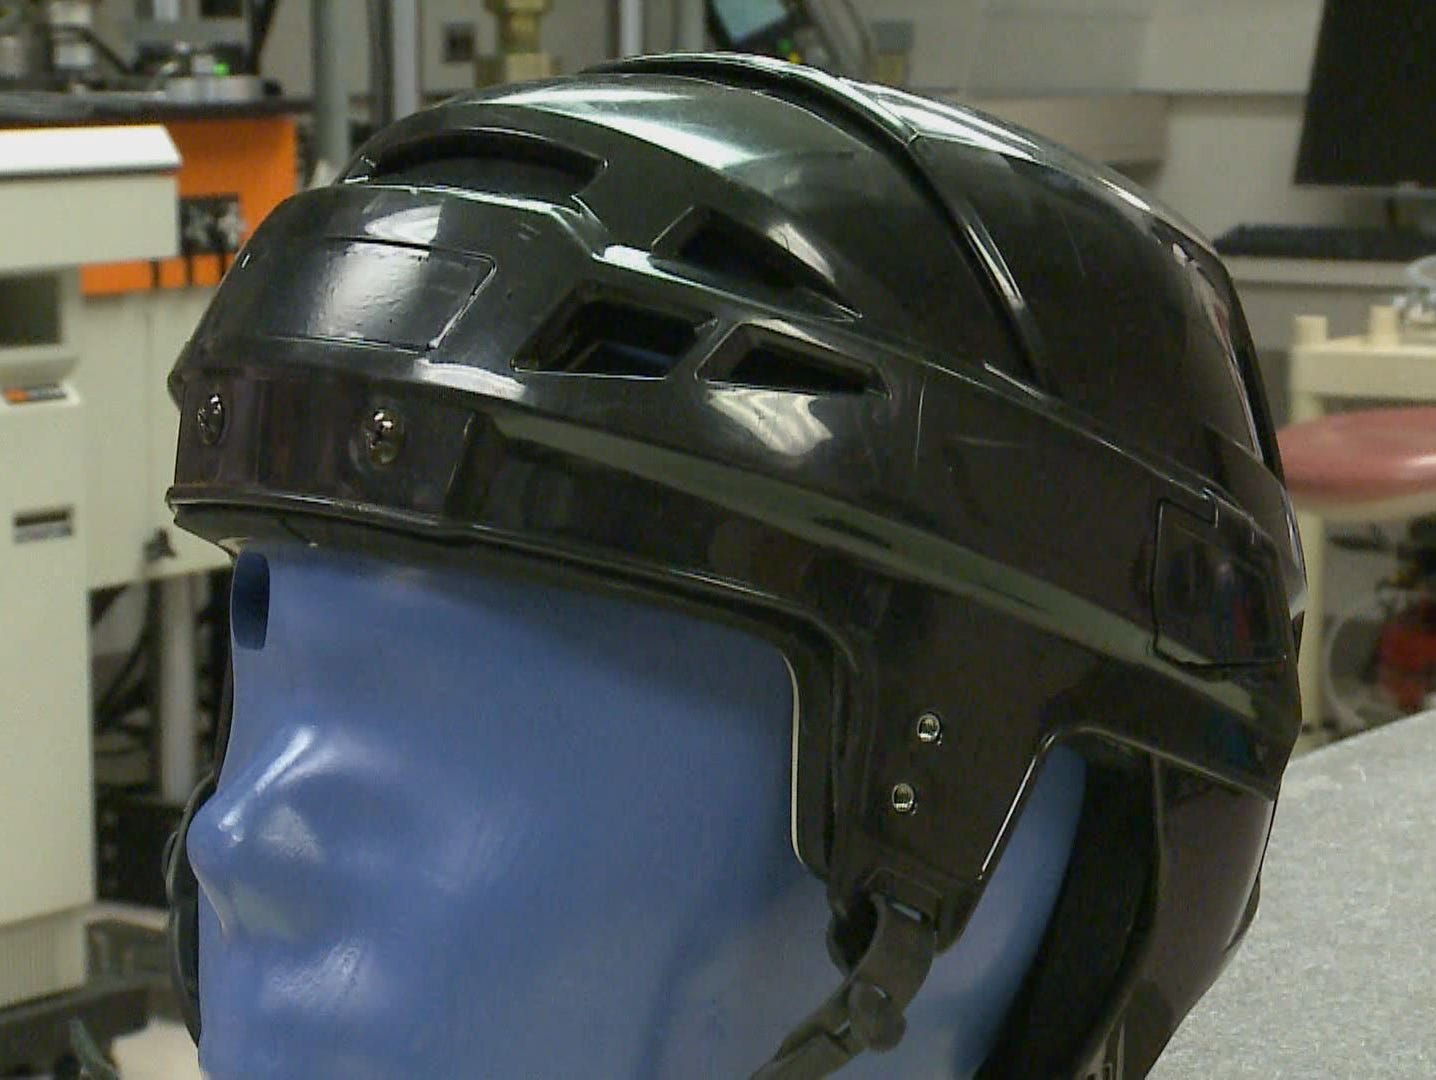 Virginia Tech's STAR helmet ratings